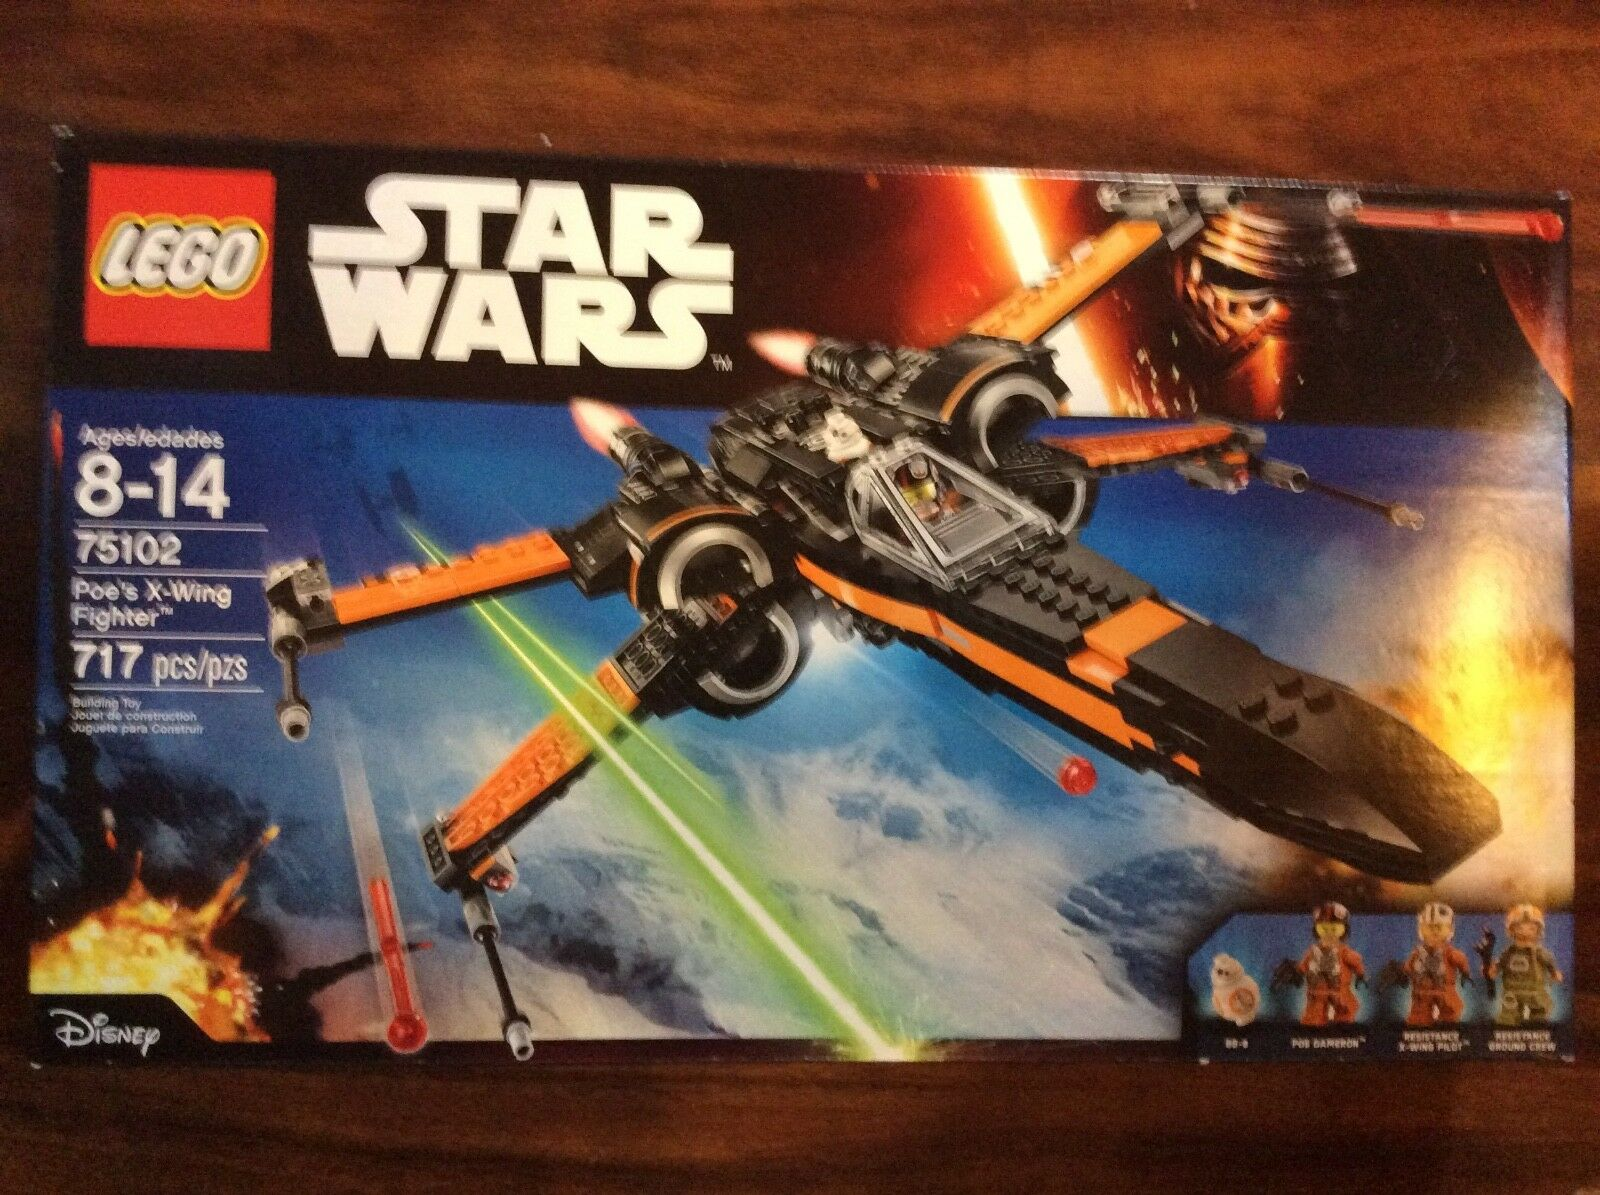 Neue lego - star - wars - poe x-wing kämpfer setzen 75102 in versiegelten kiste shelfwear